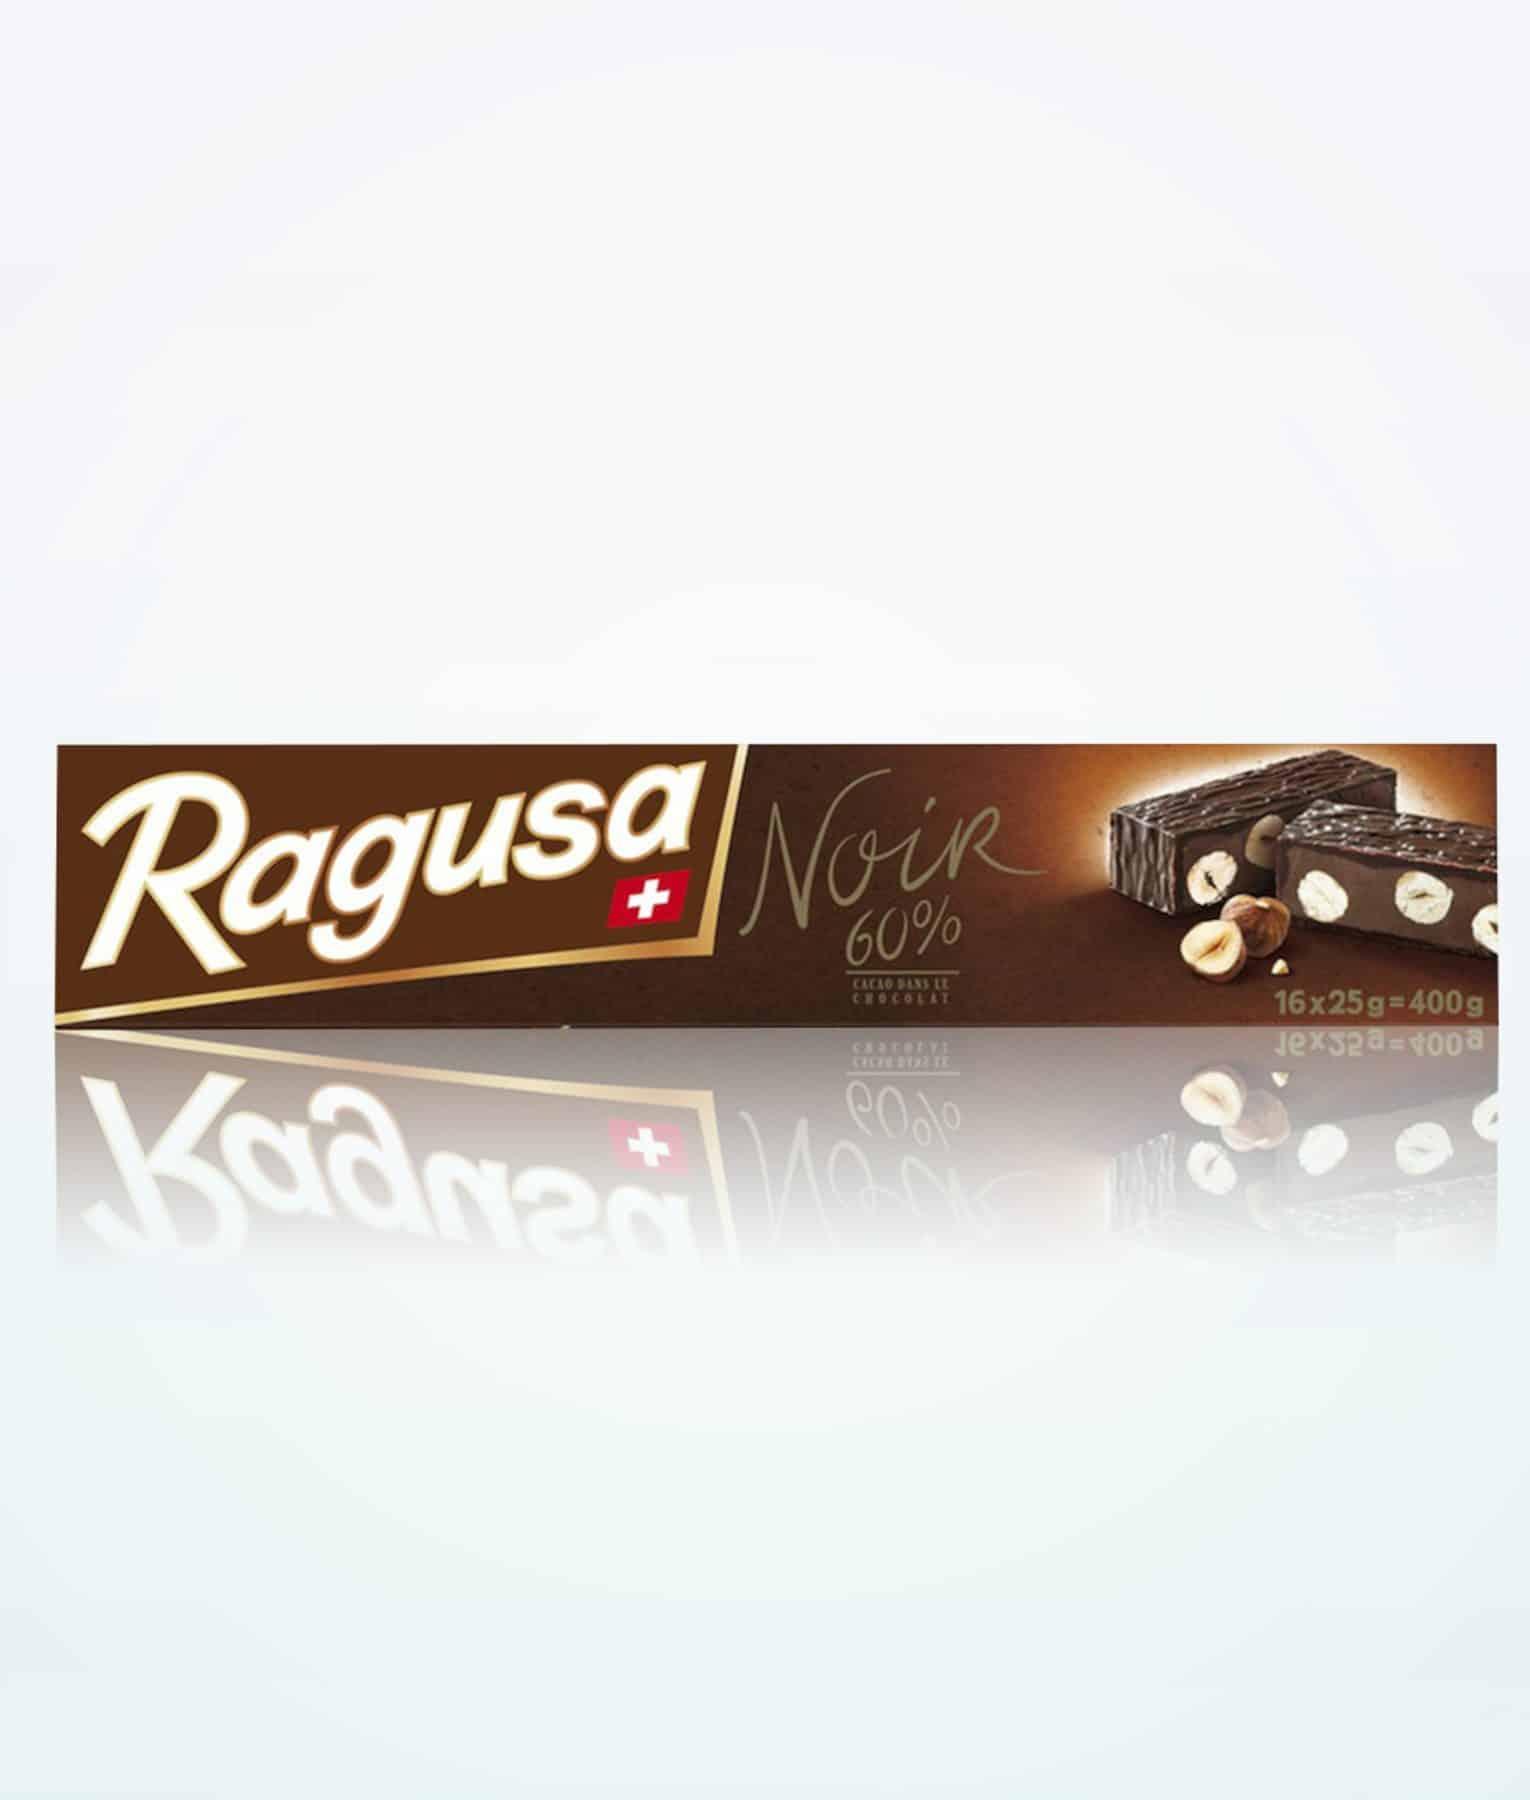 ragusa-dark-chocolate-400g